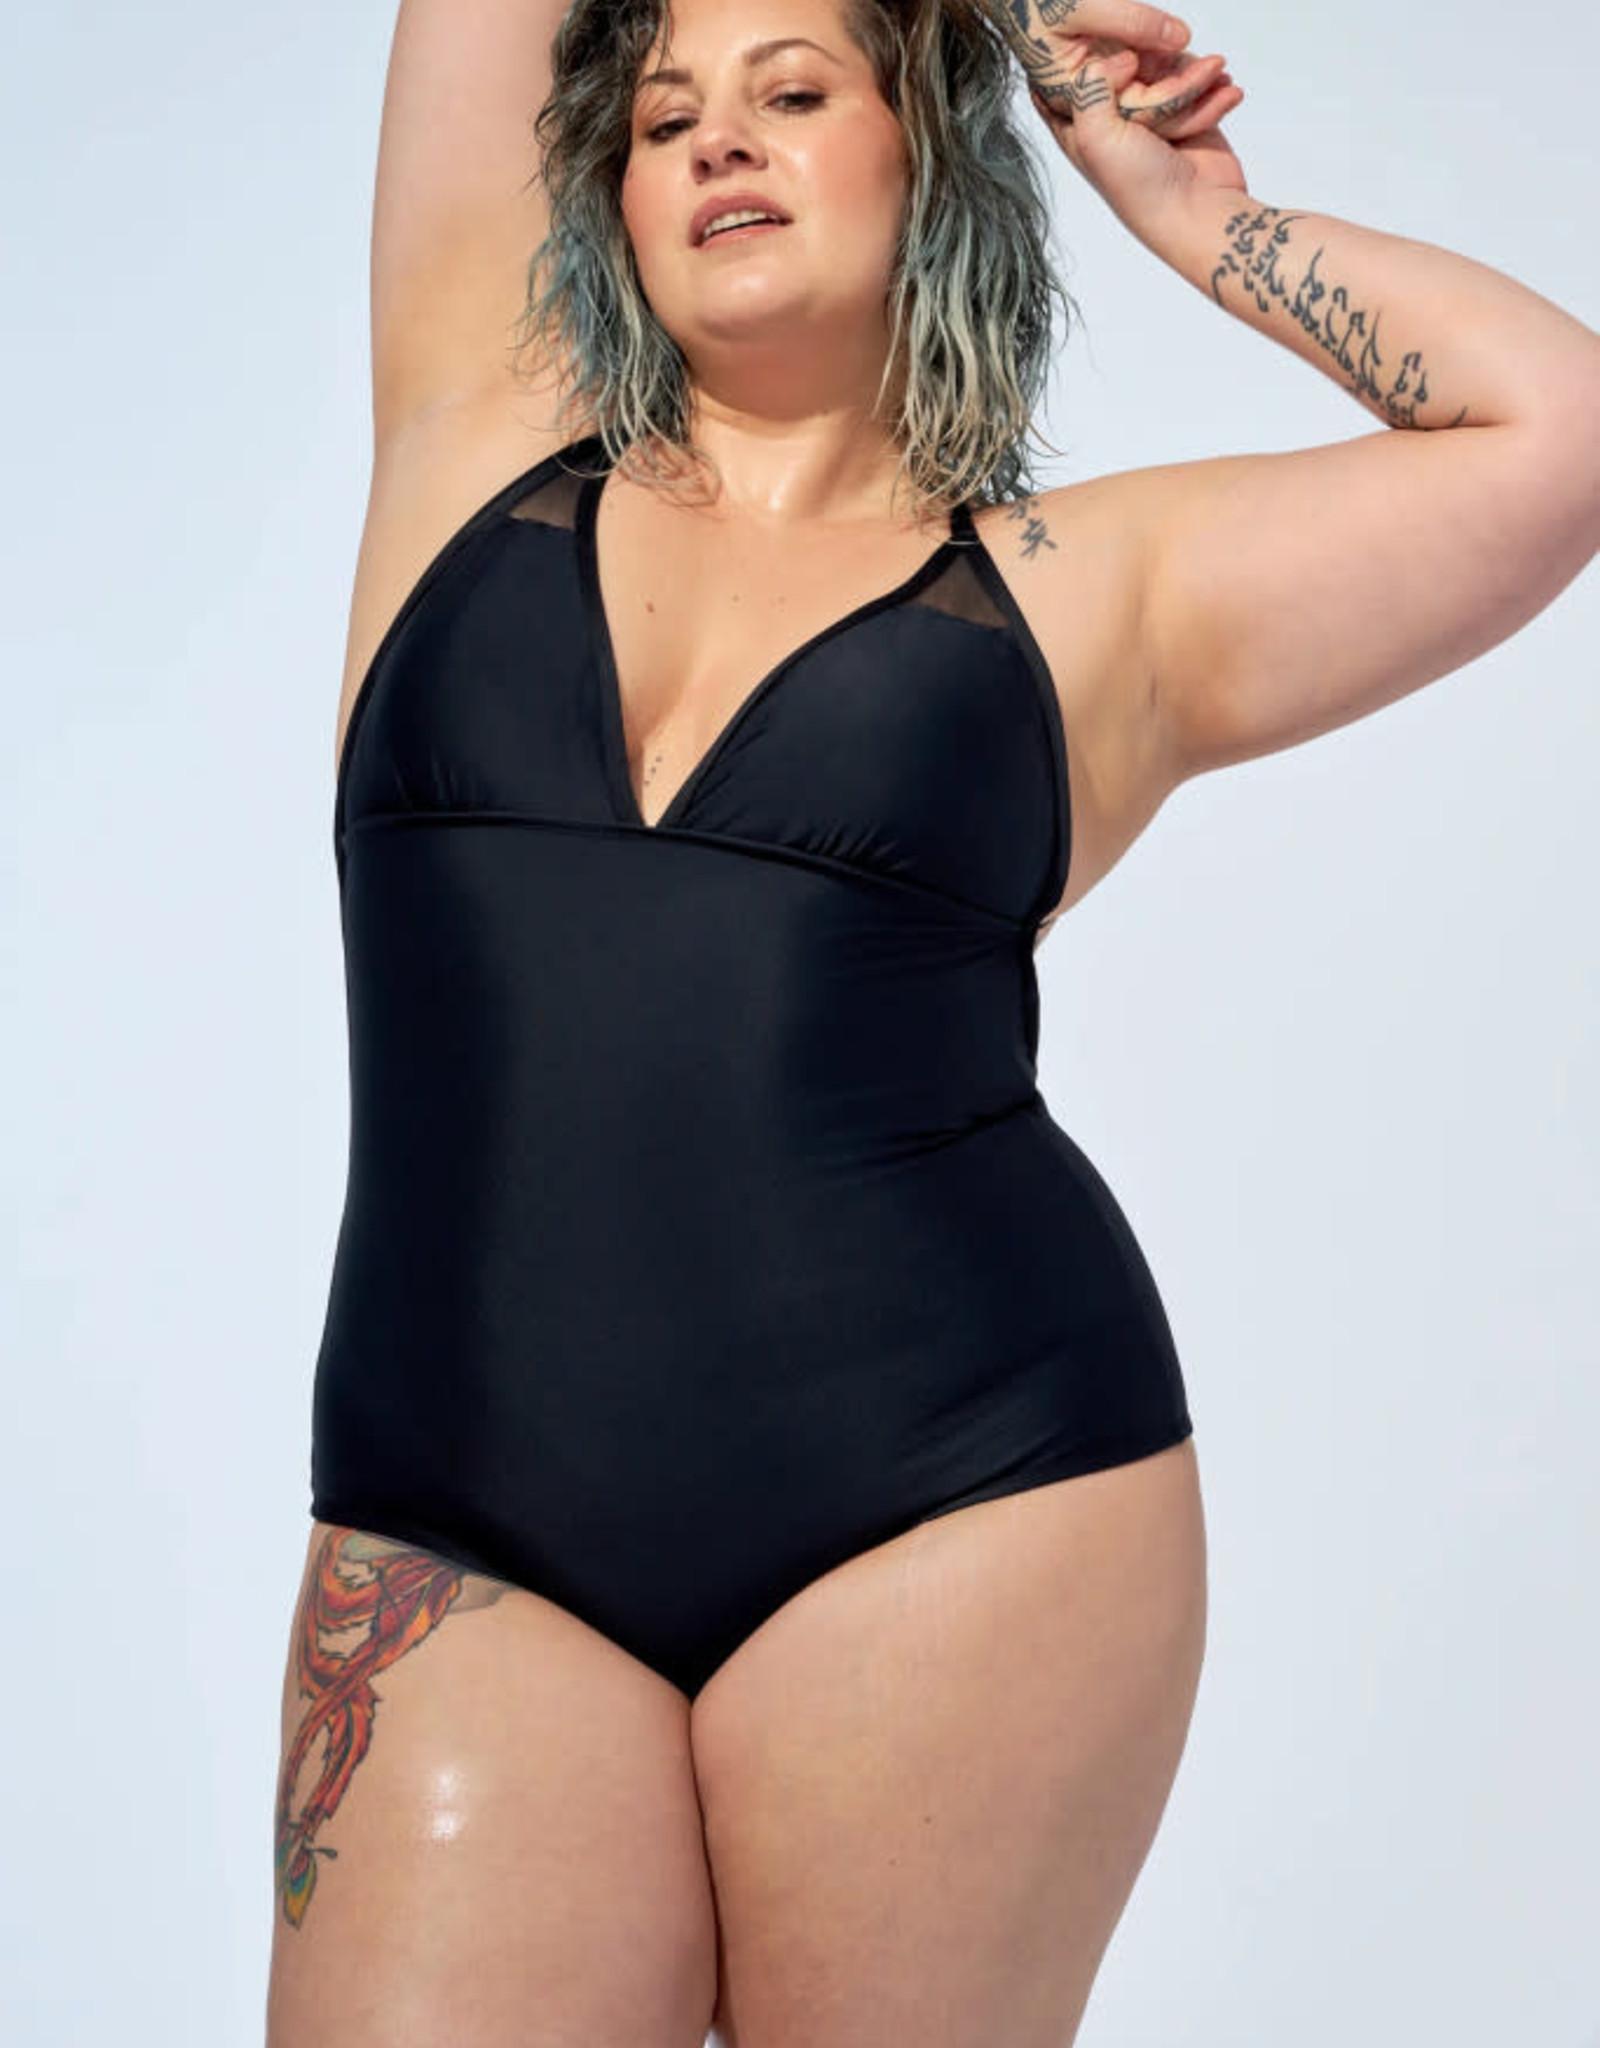 Selfish Swimwear Maillot one piece PE21 Michelle Selfish Swimwear Noir